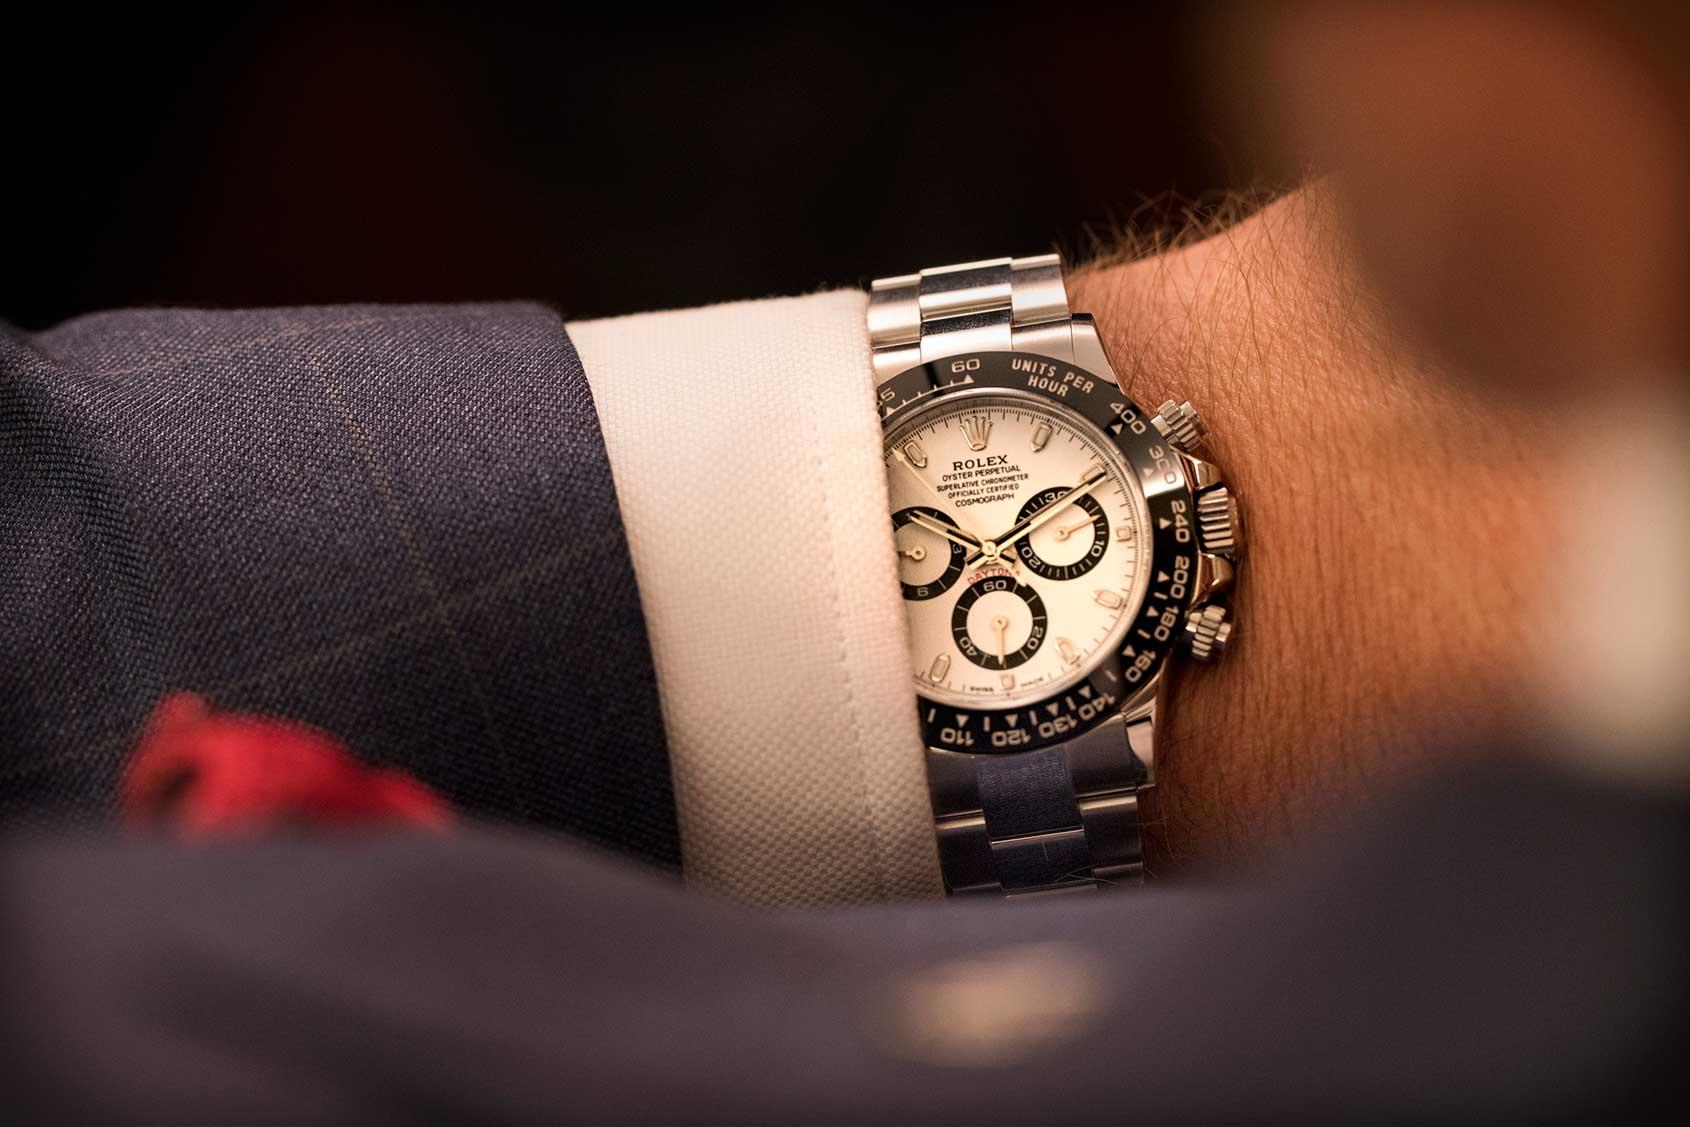 orologi in acciaio inossidabile